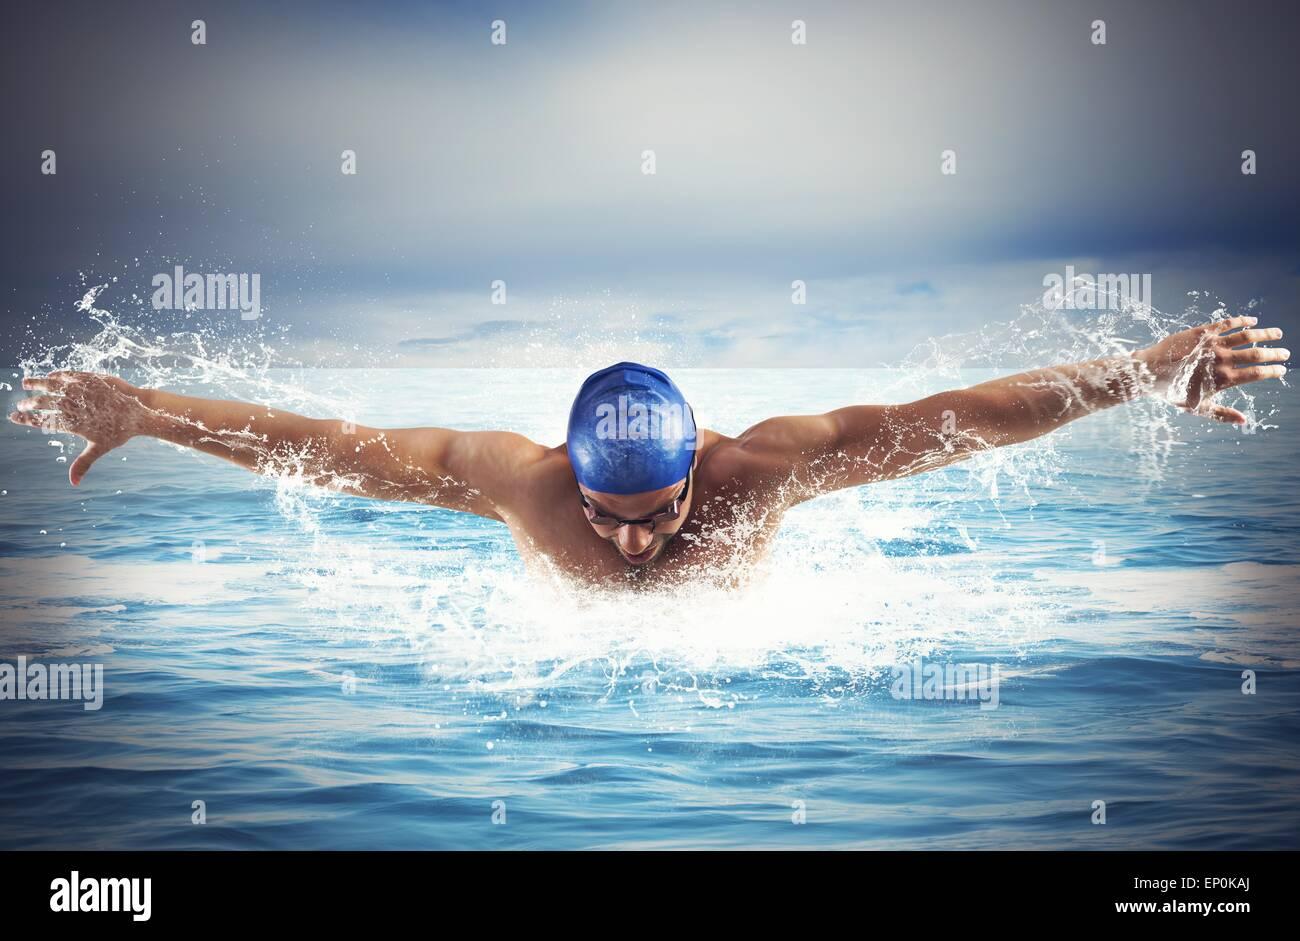 Swimming in the sea - Stock Image